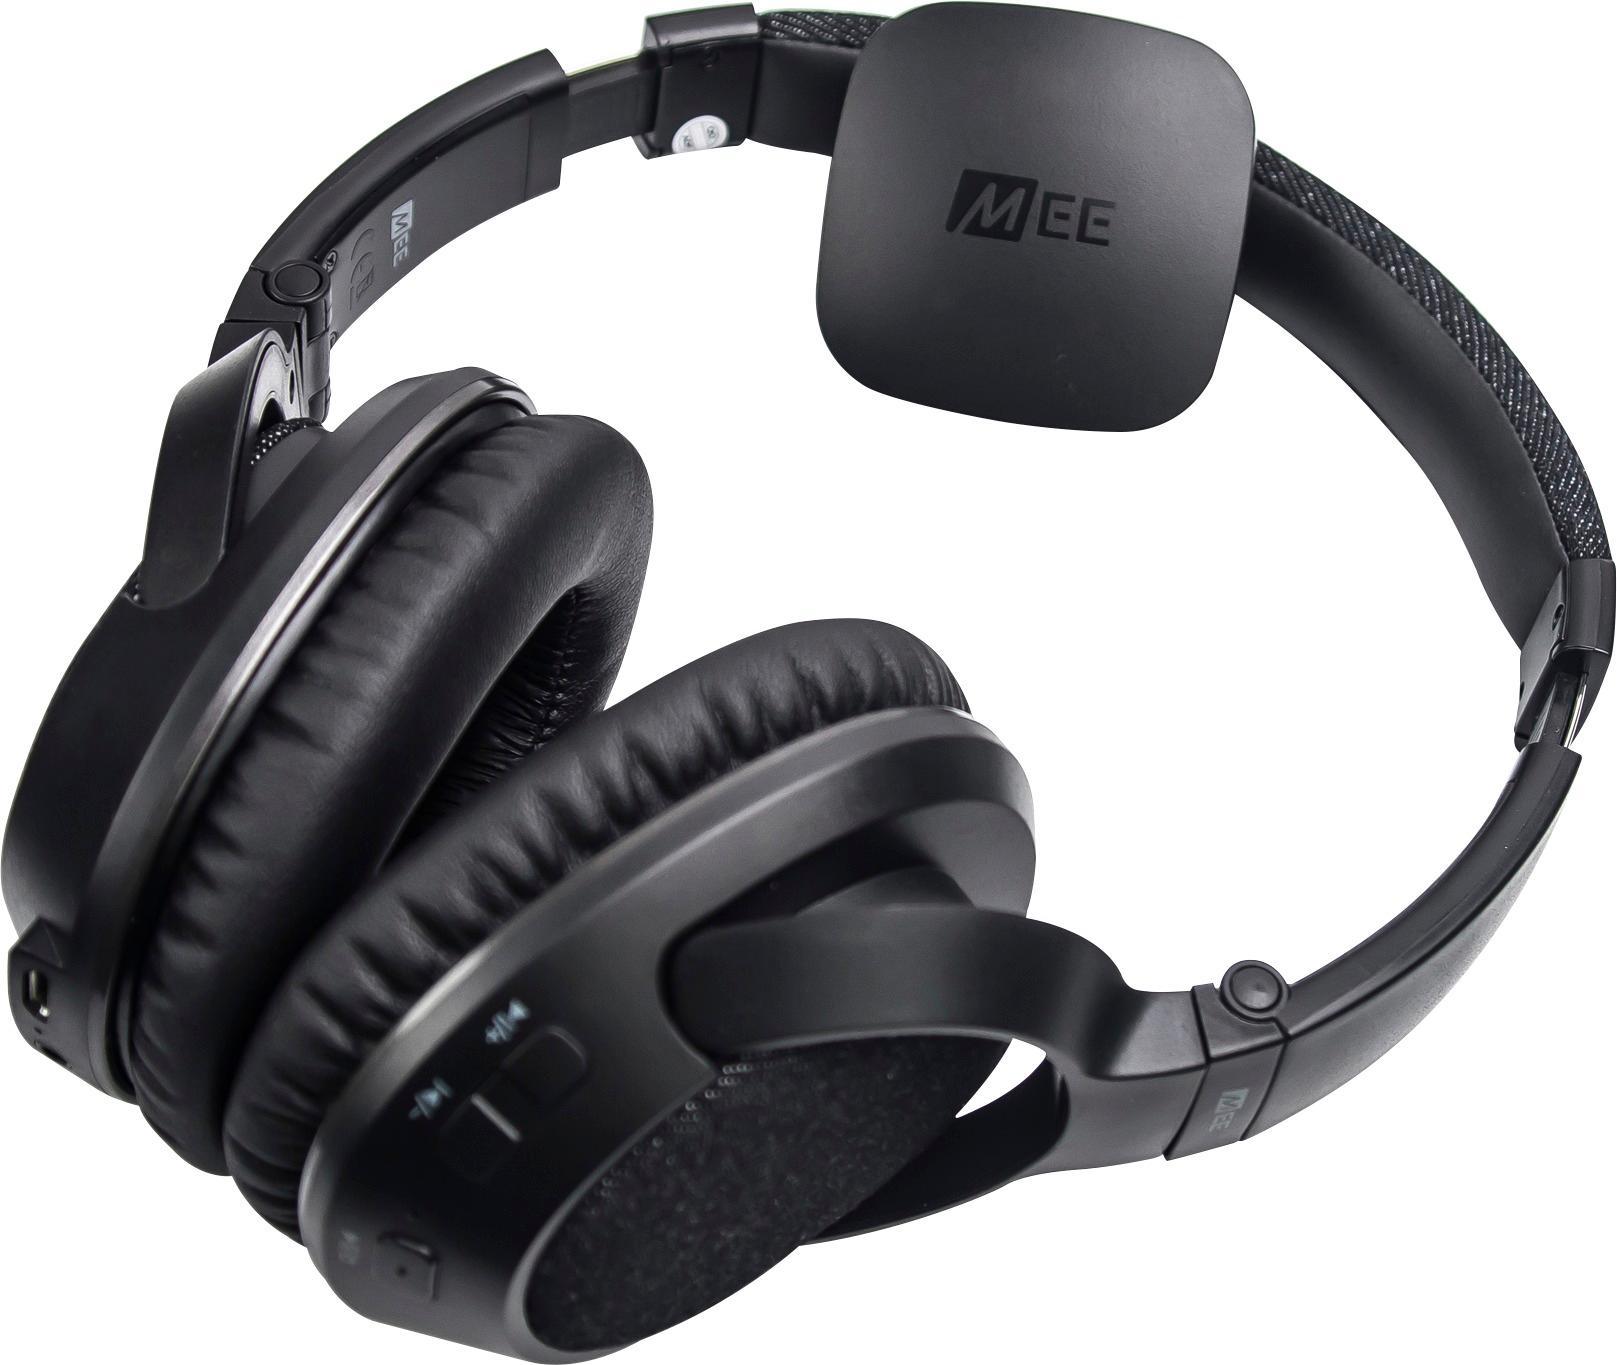 MEE audio MATRIX3 Wireless Over-the-Ear Headphones Black CMB-T1M3-MEE